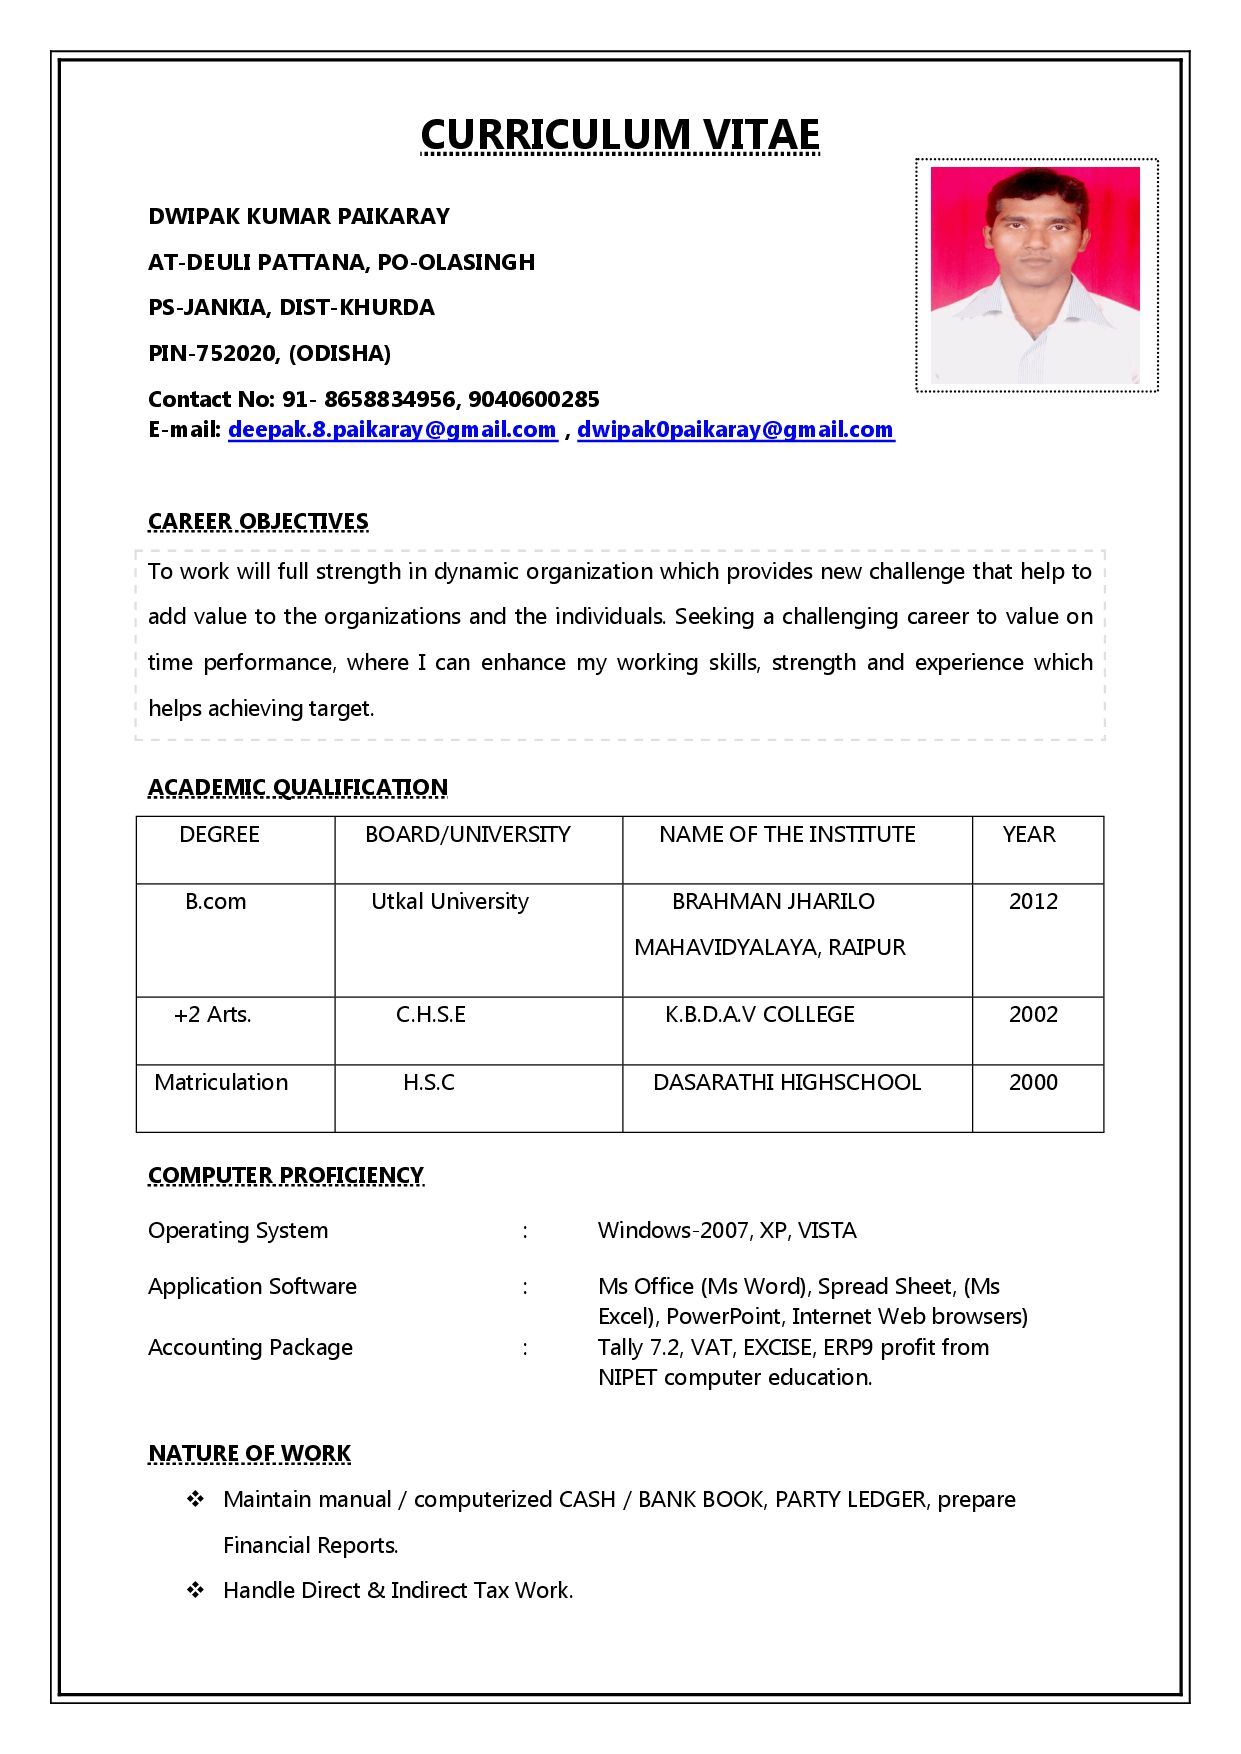 Resume Sample For Job Application Word File